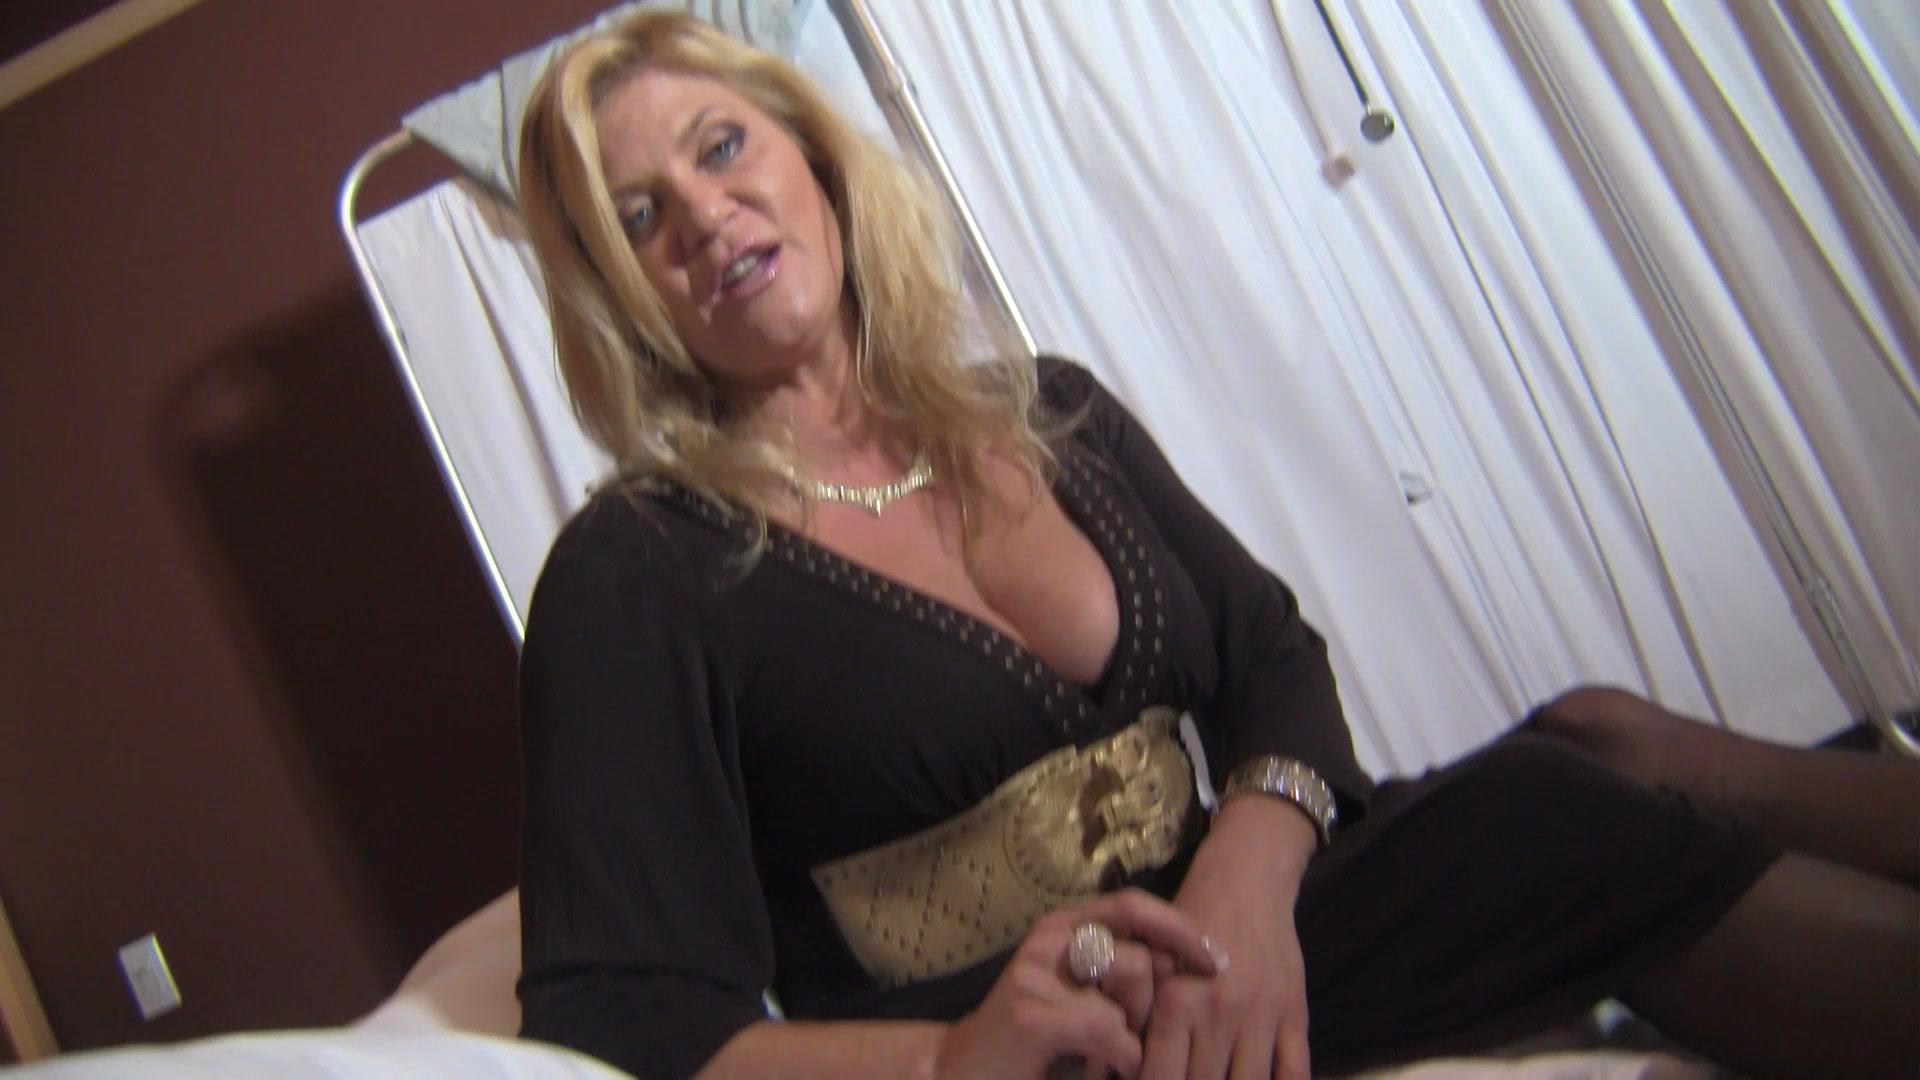 Instructional sex position